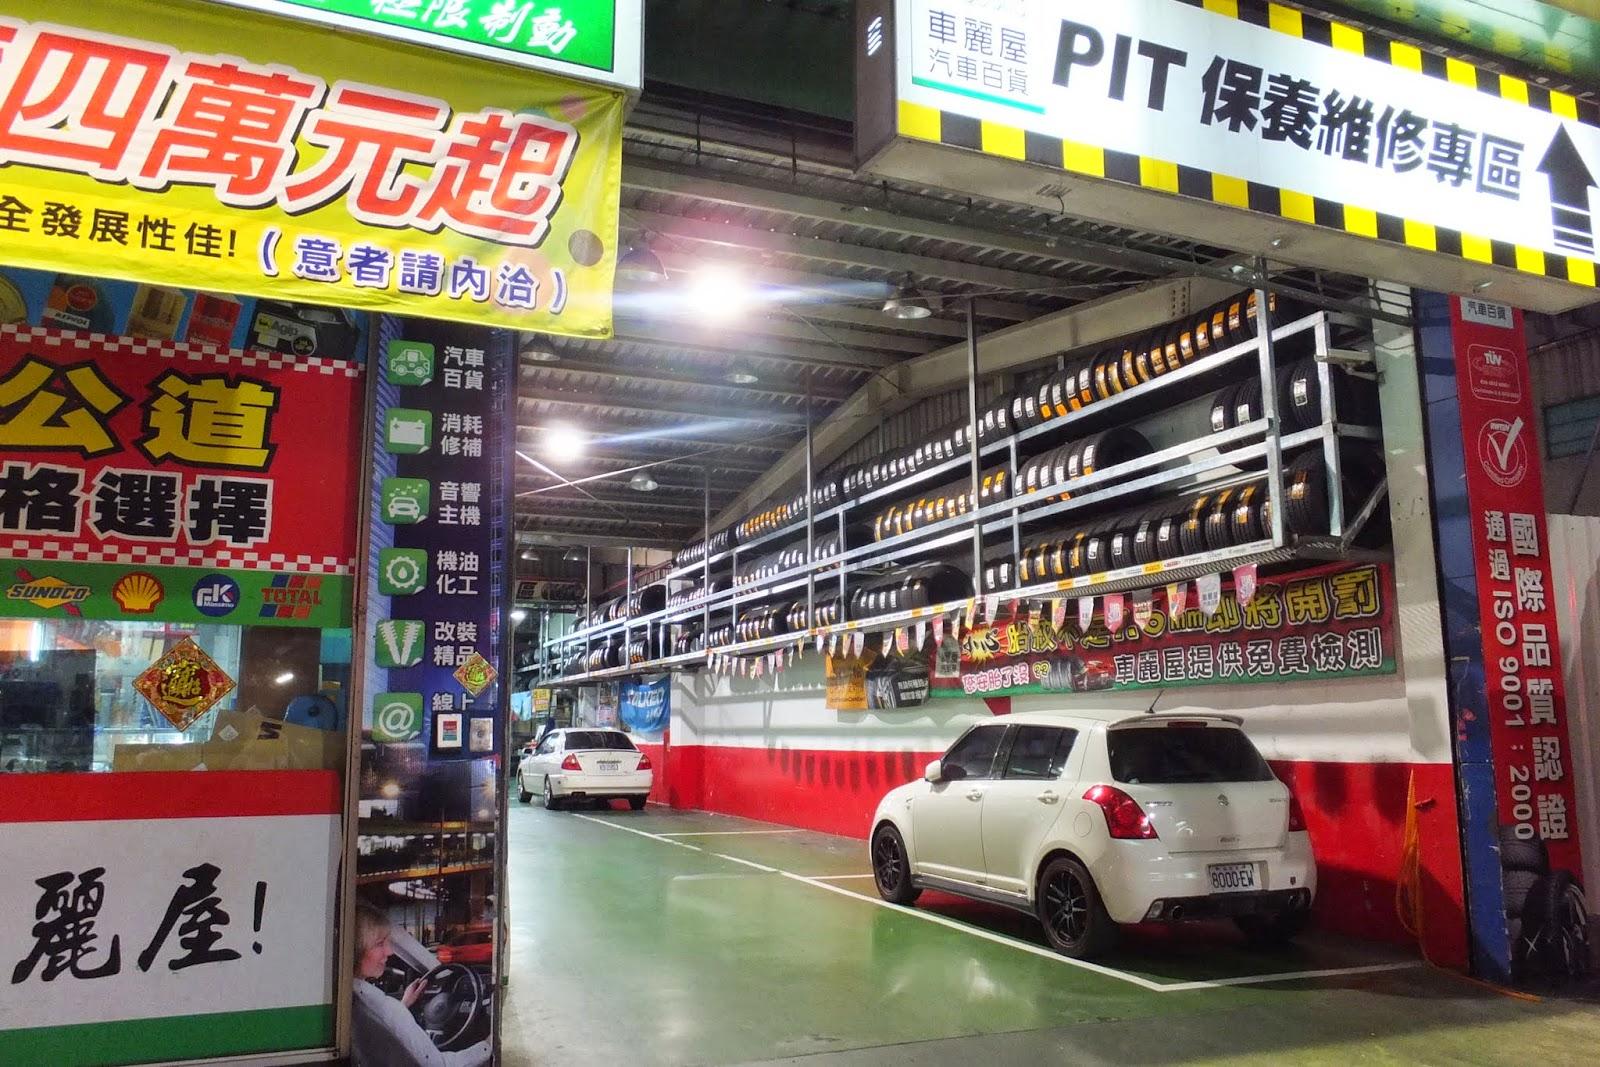 Taiwan-car-maintenance-shop 台湾のカーメンテナンスショップ